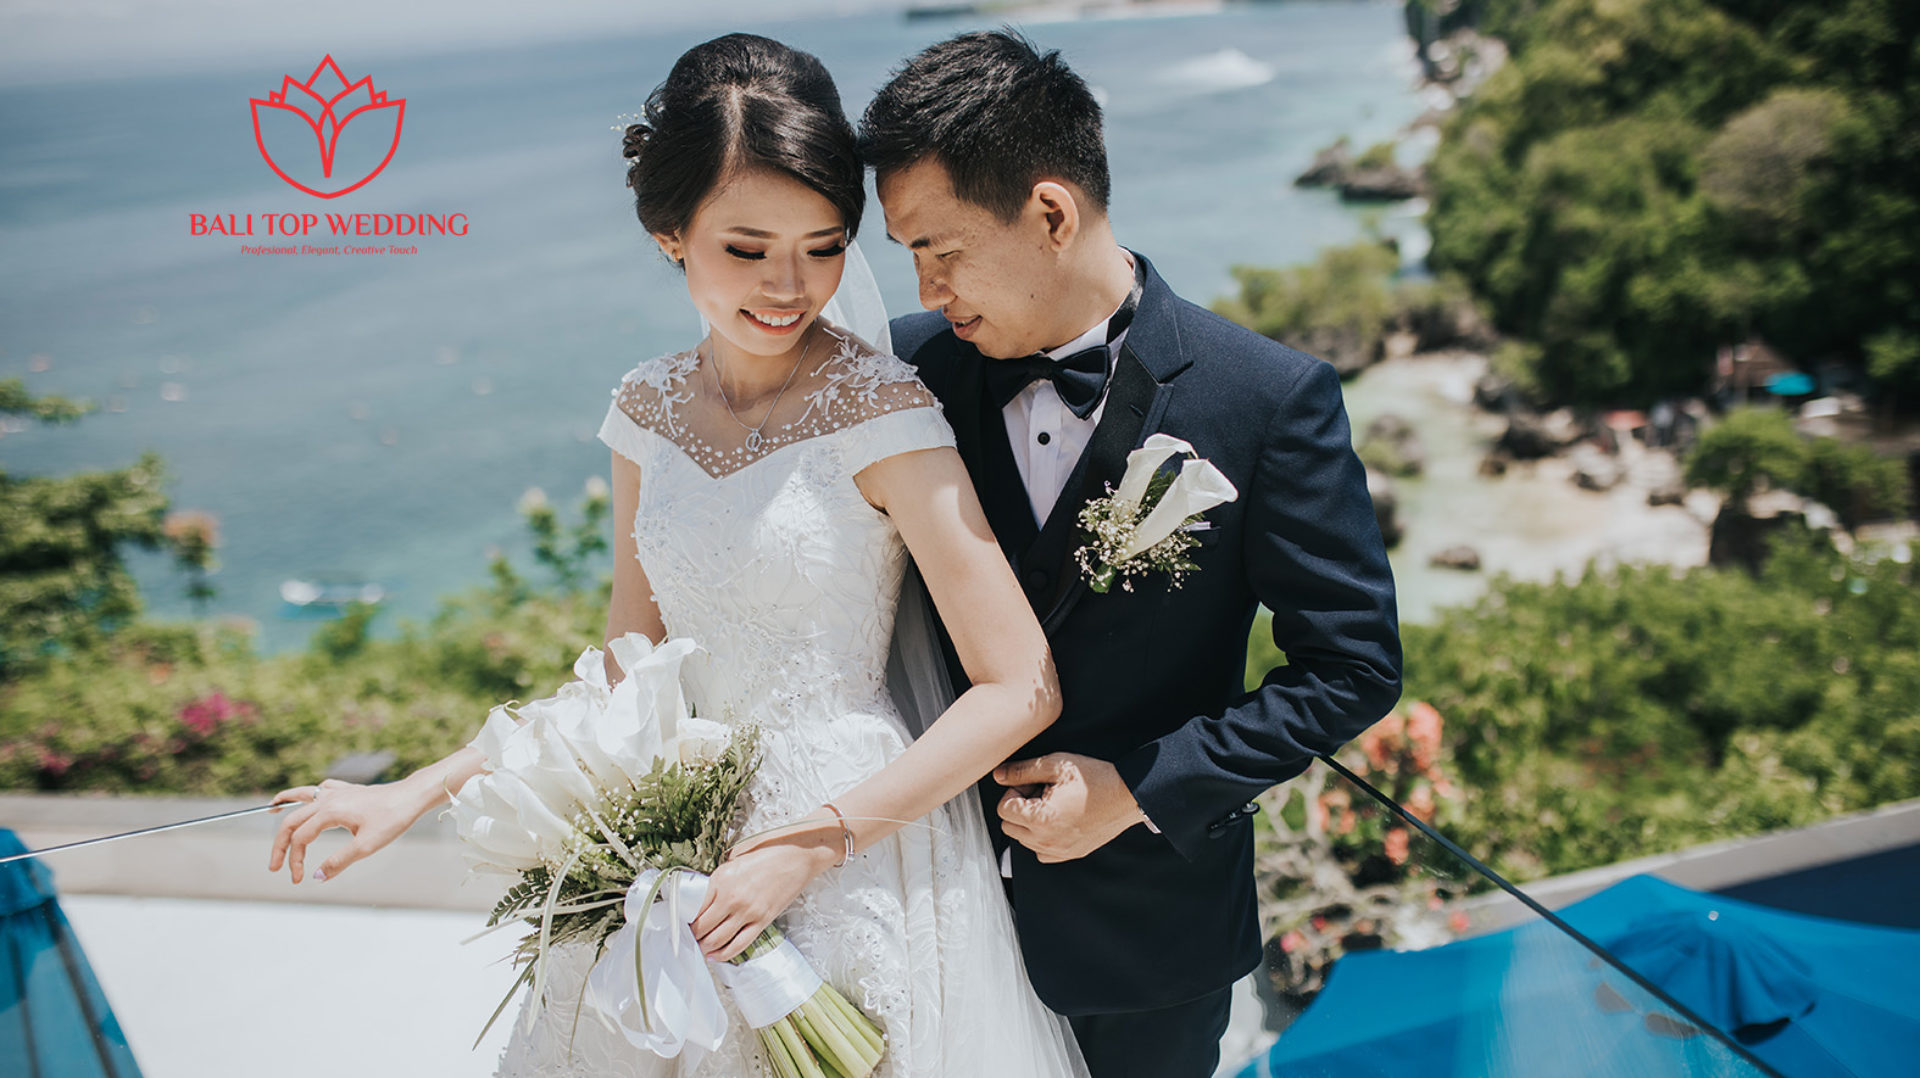 Bali Top Wedding